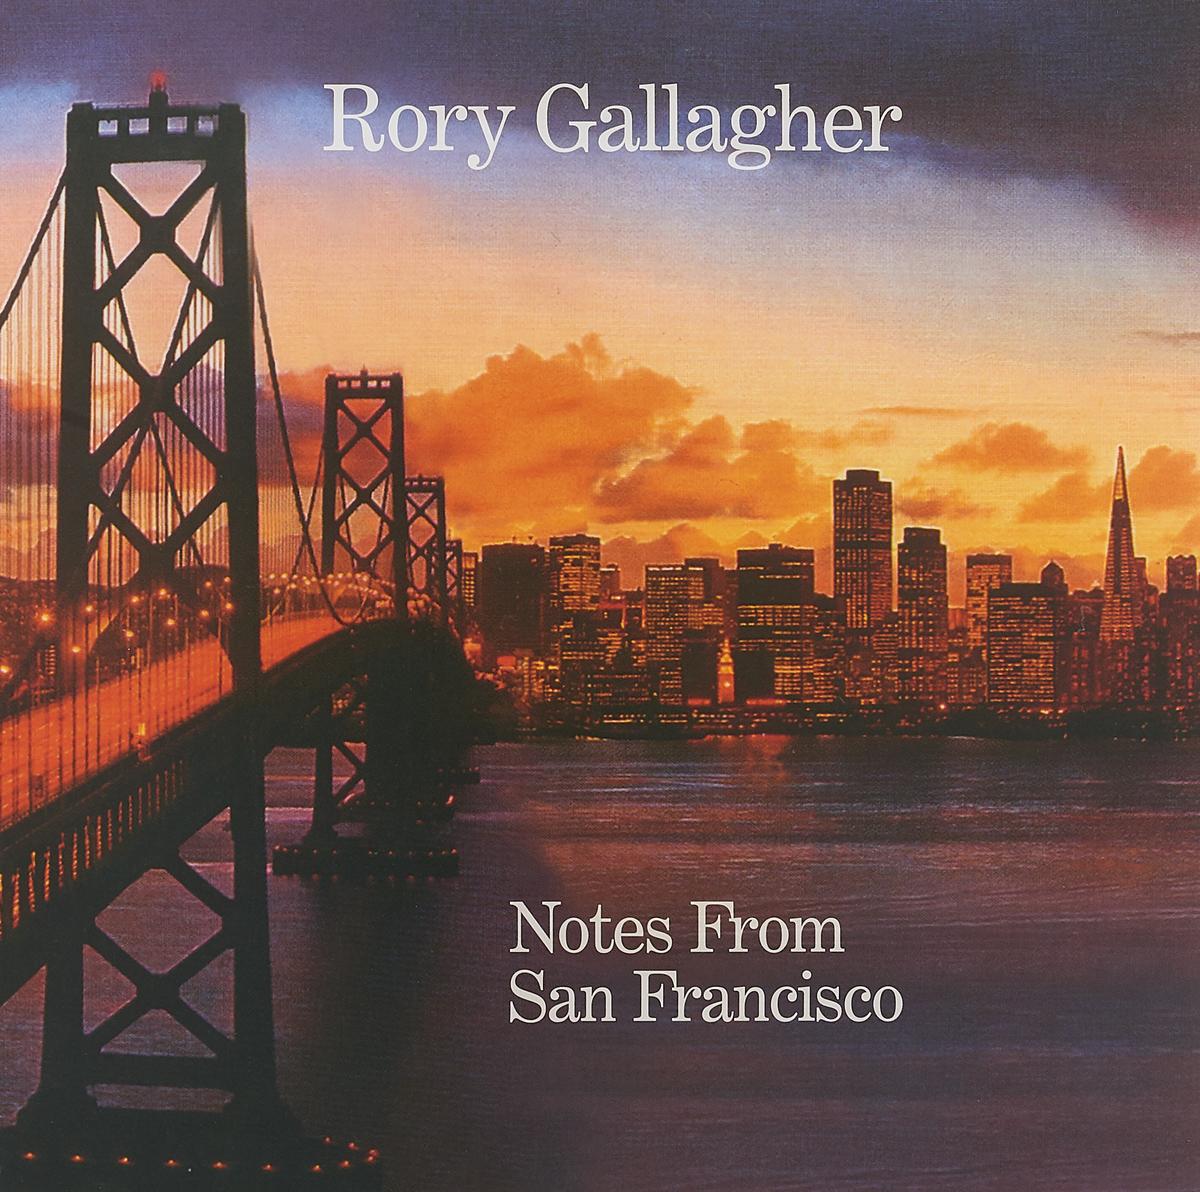 Рори Галлахер Rory Gallagher. Notes From San Francisco (LP) недорго, оригинальная цена